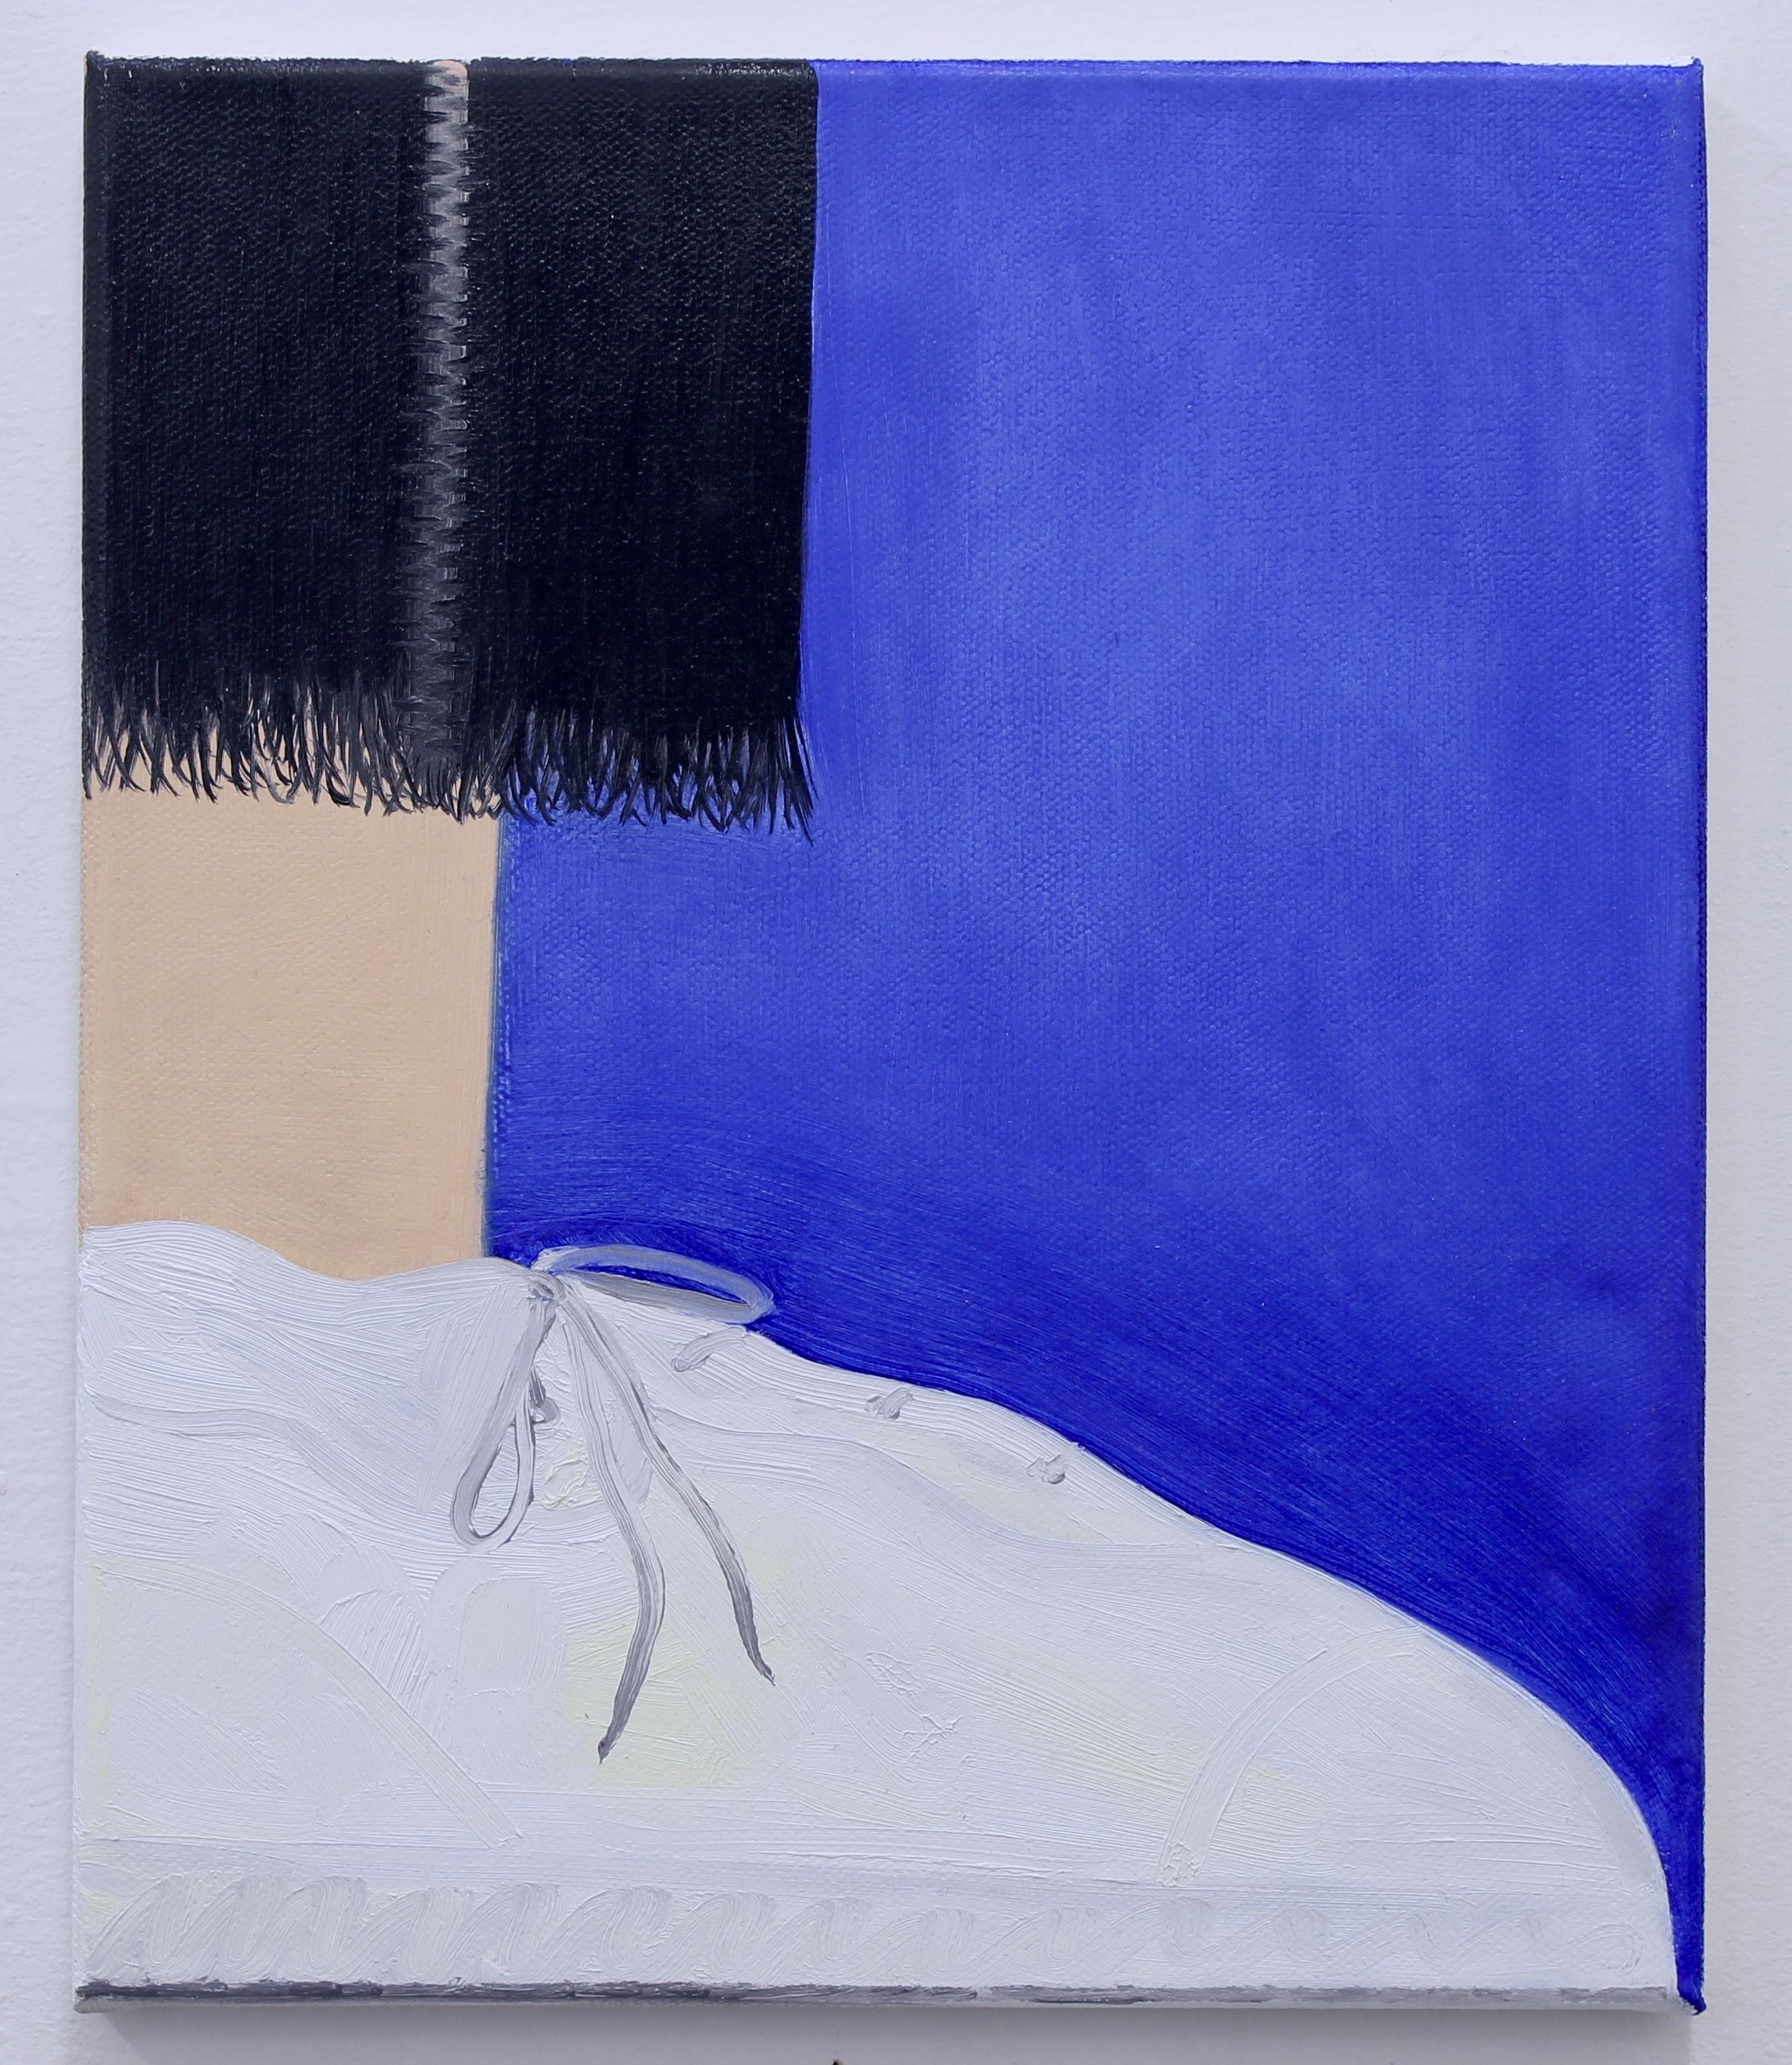 Black Fringe , oil on canvas, 30 x 25 cm, 2018